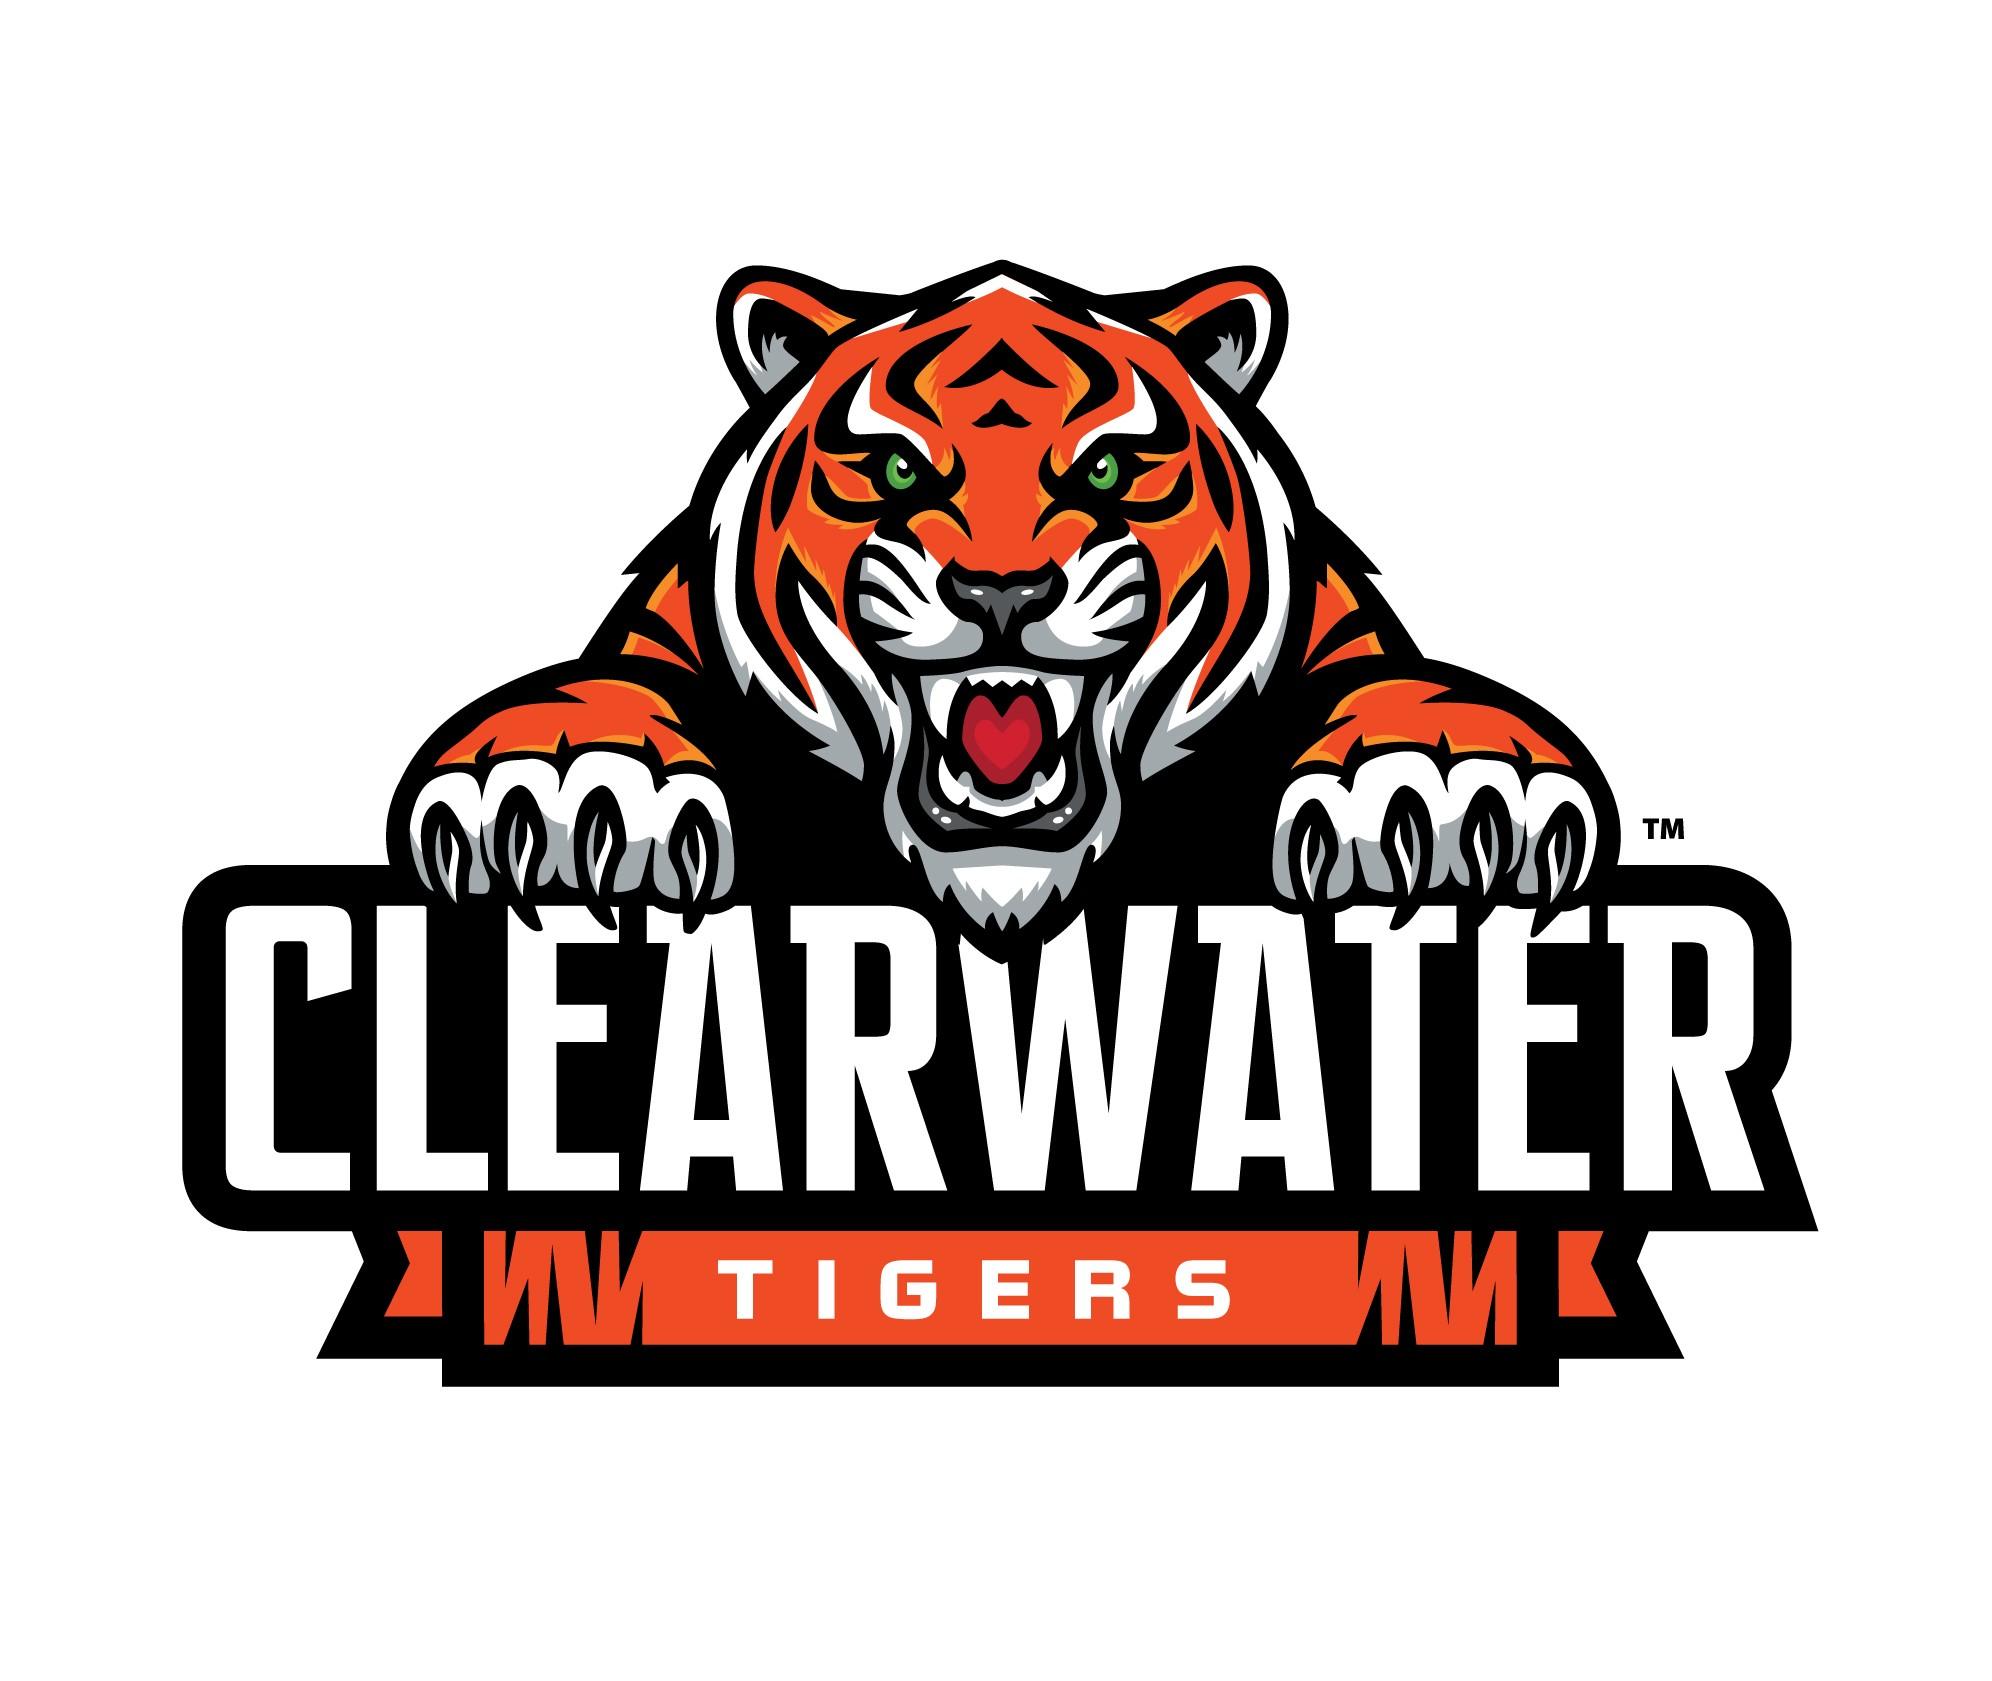 Clearwater Highschool